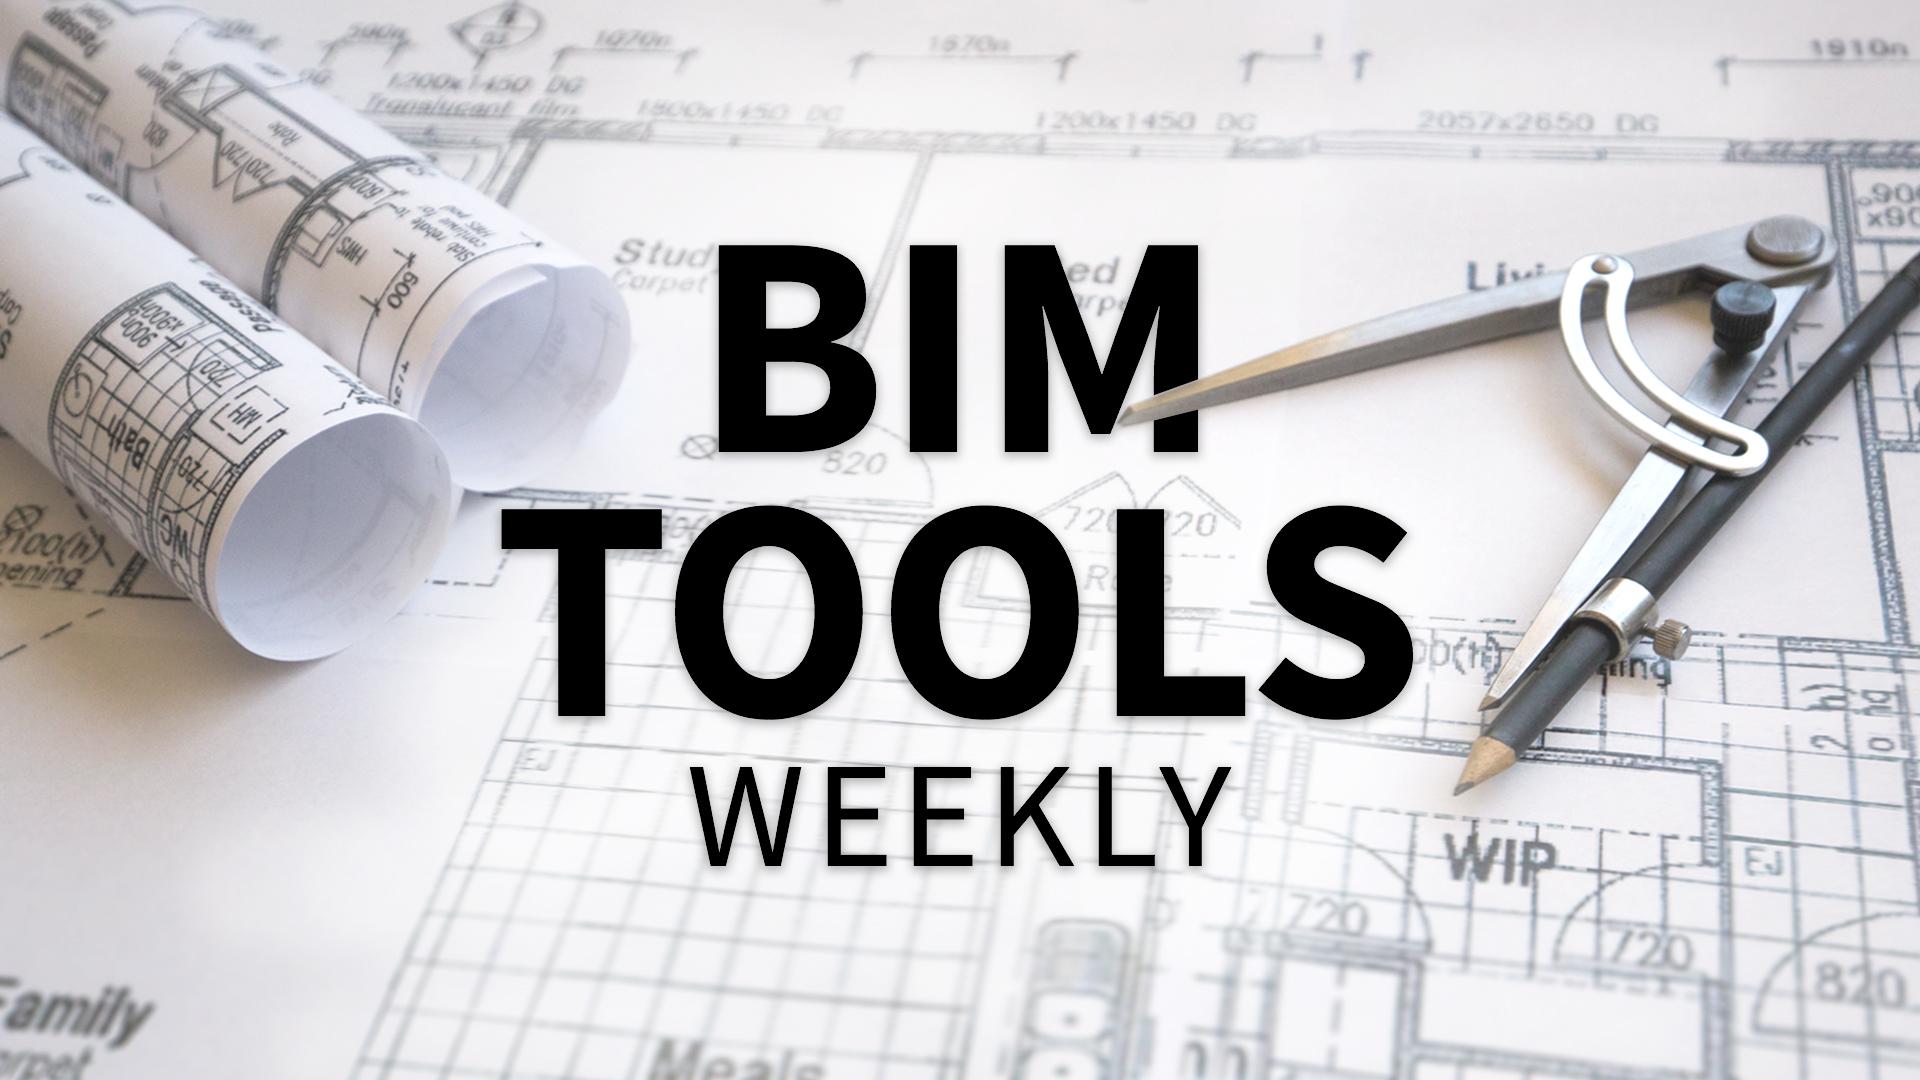 BIM Tools Weekly